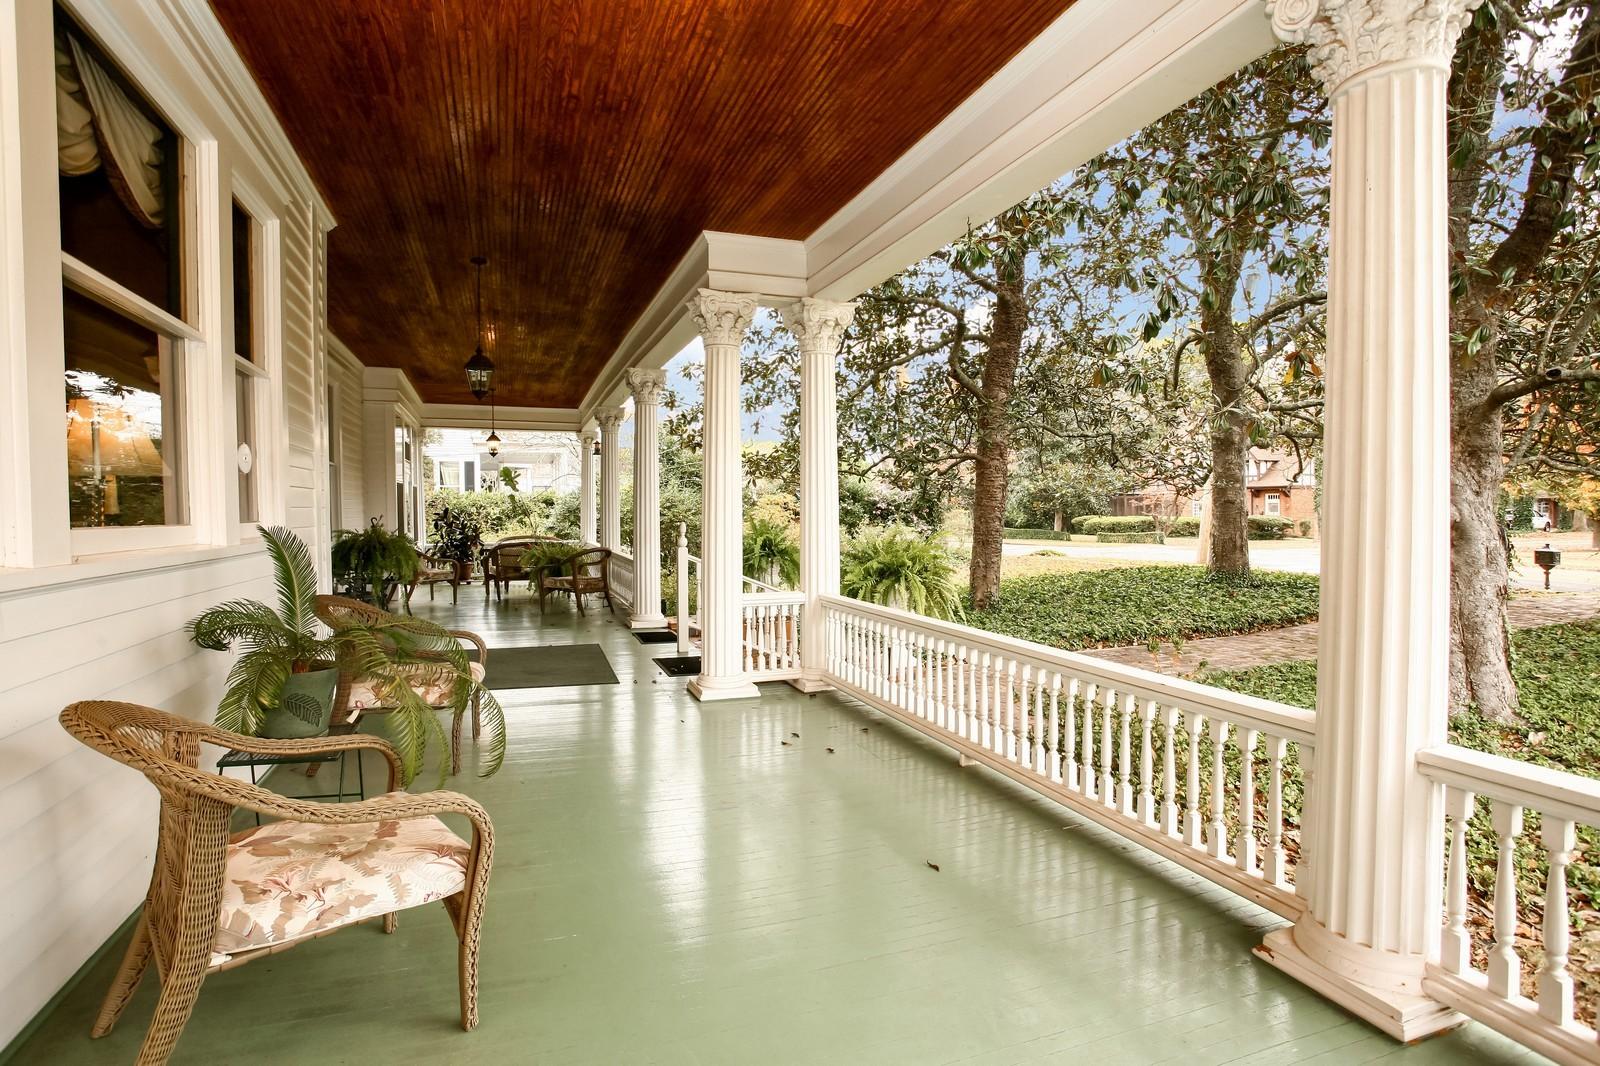 Real Estate Photography - 414 N 14th St, Lanett, AL, 36863 - Porch